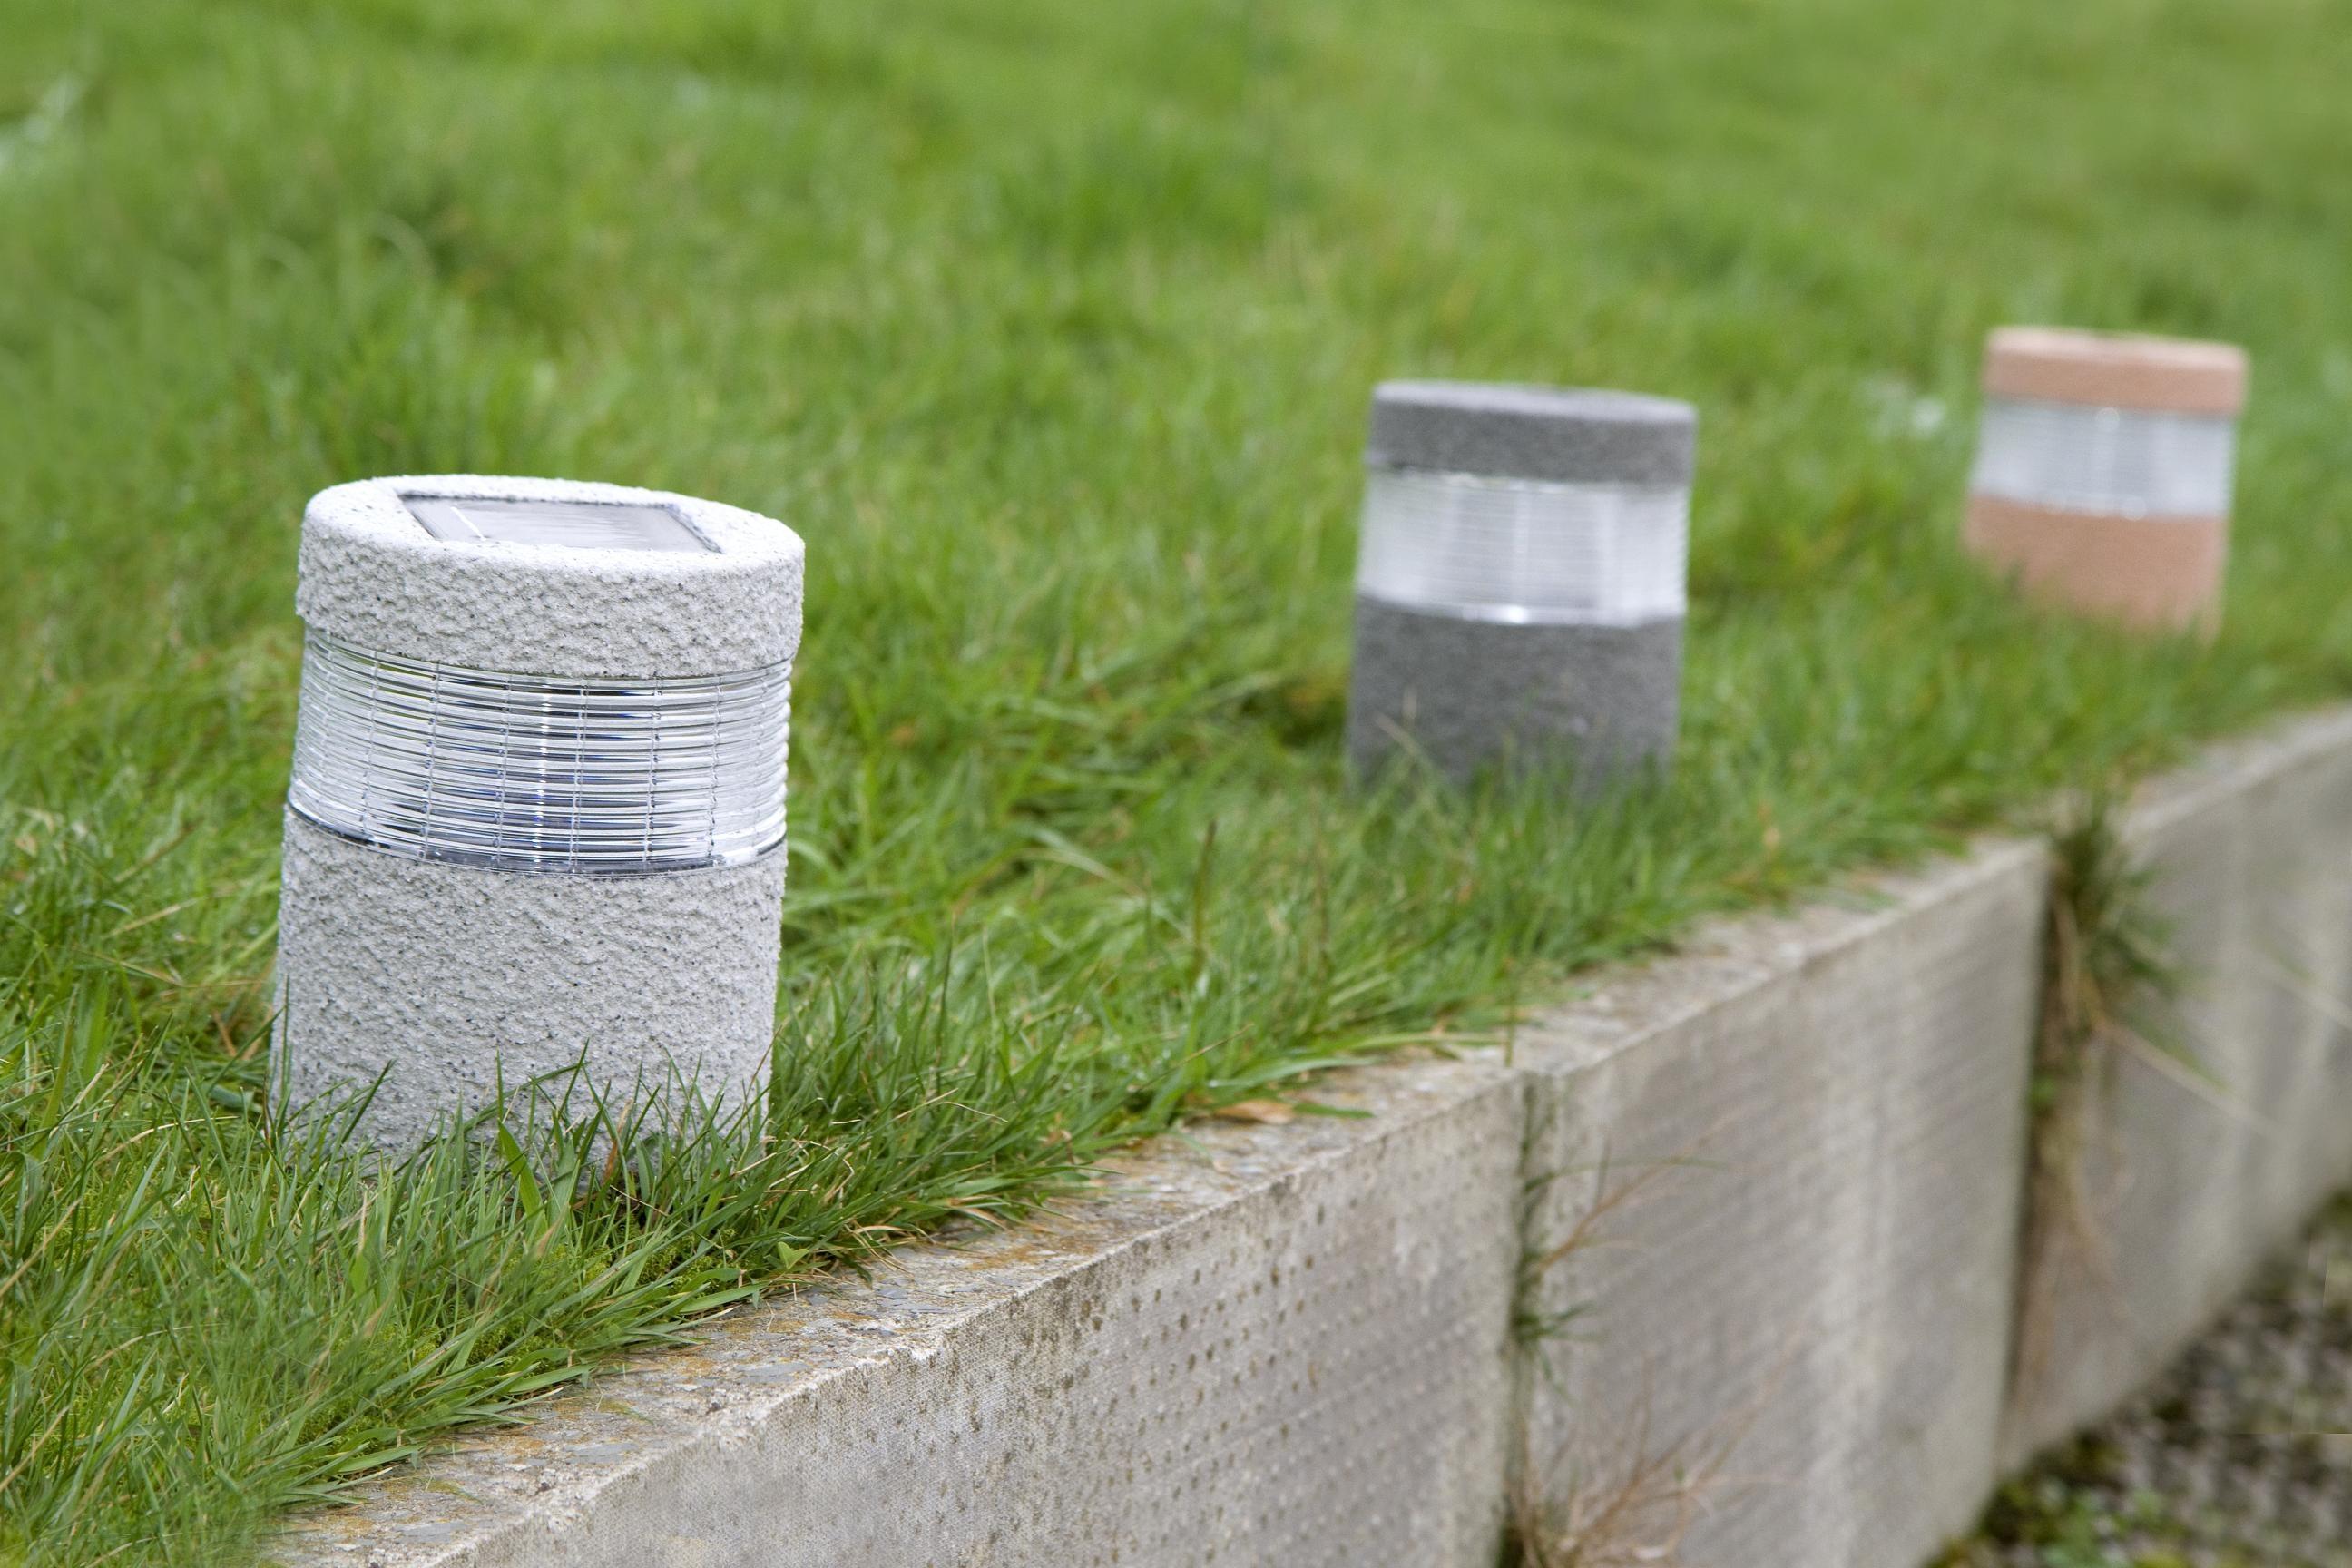 Solar Powered Led Lights Stone Effect Lamp Garden Path Driveway Outdoor Lighting Ebay